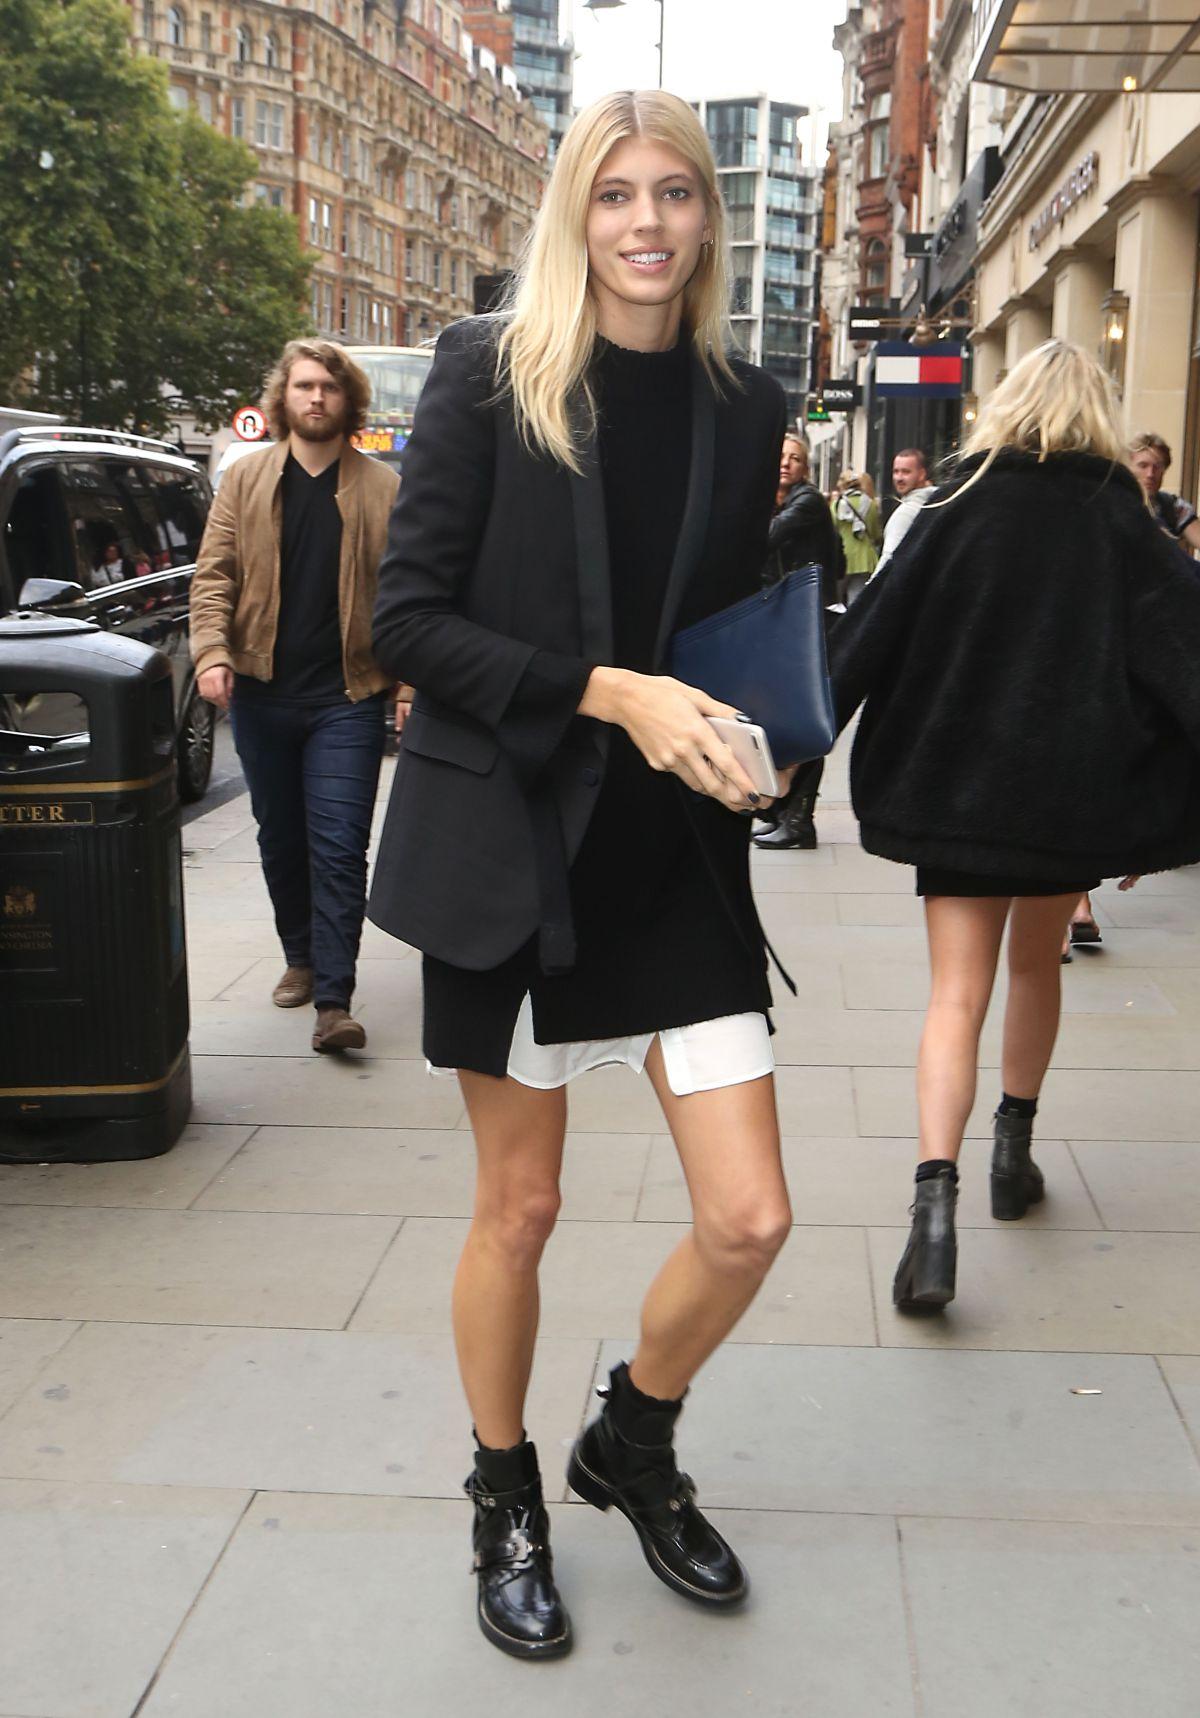 DEVON WINDSOR Arrives at Tommy Hilfiger Fashion Show at London Fashion Week 09/19/2017